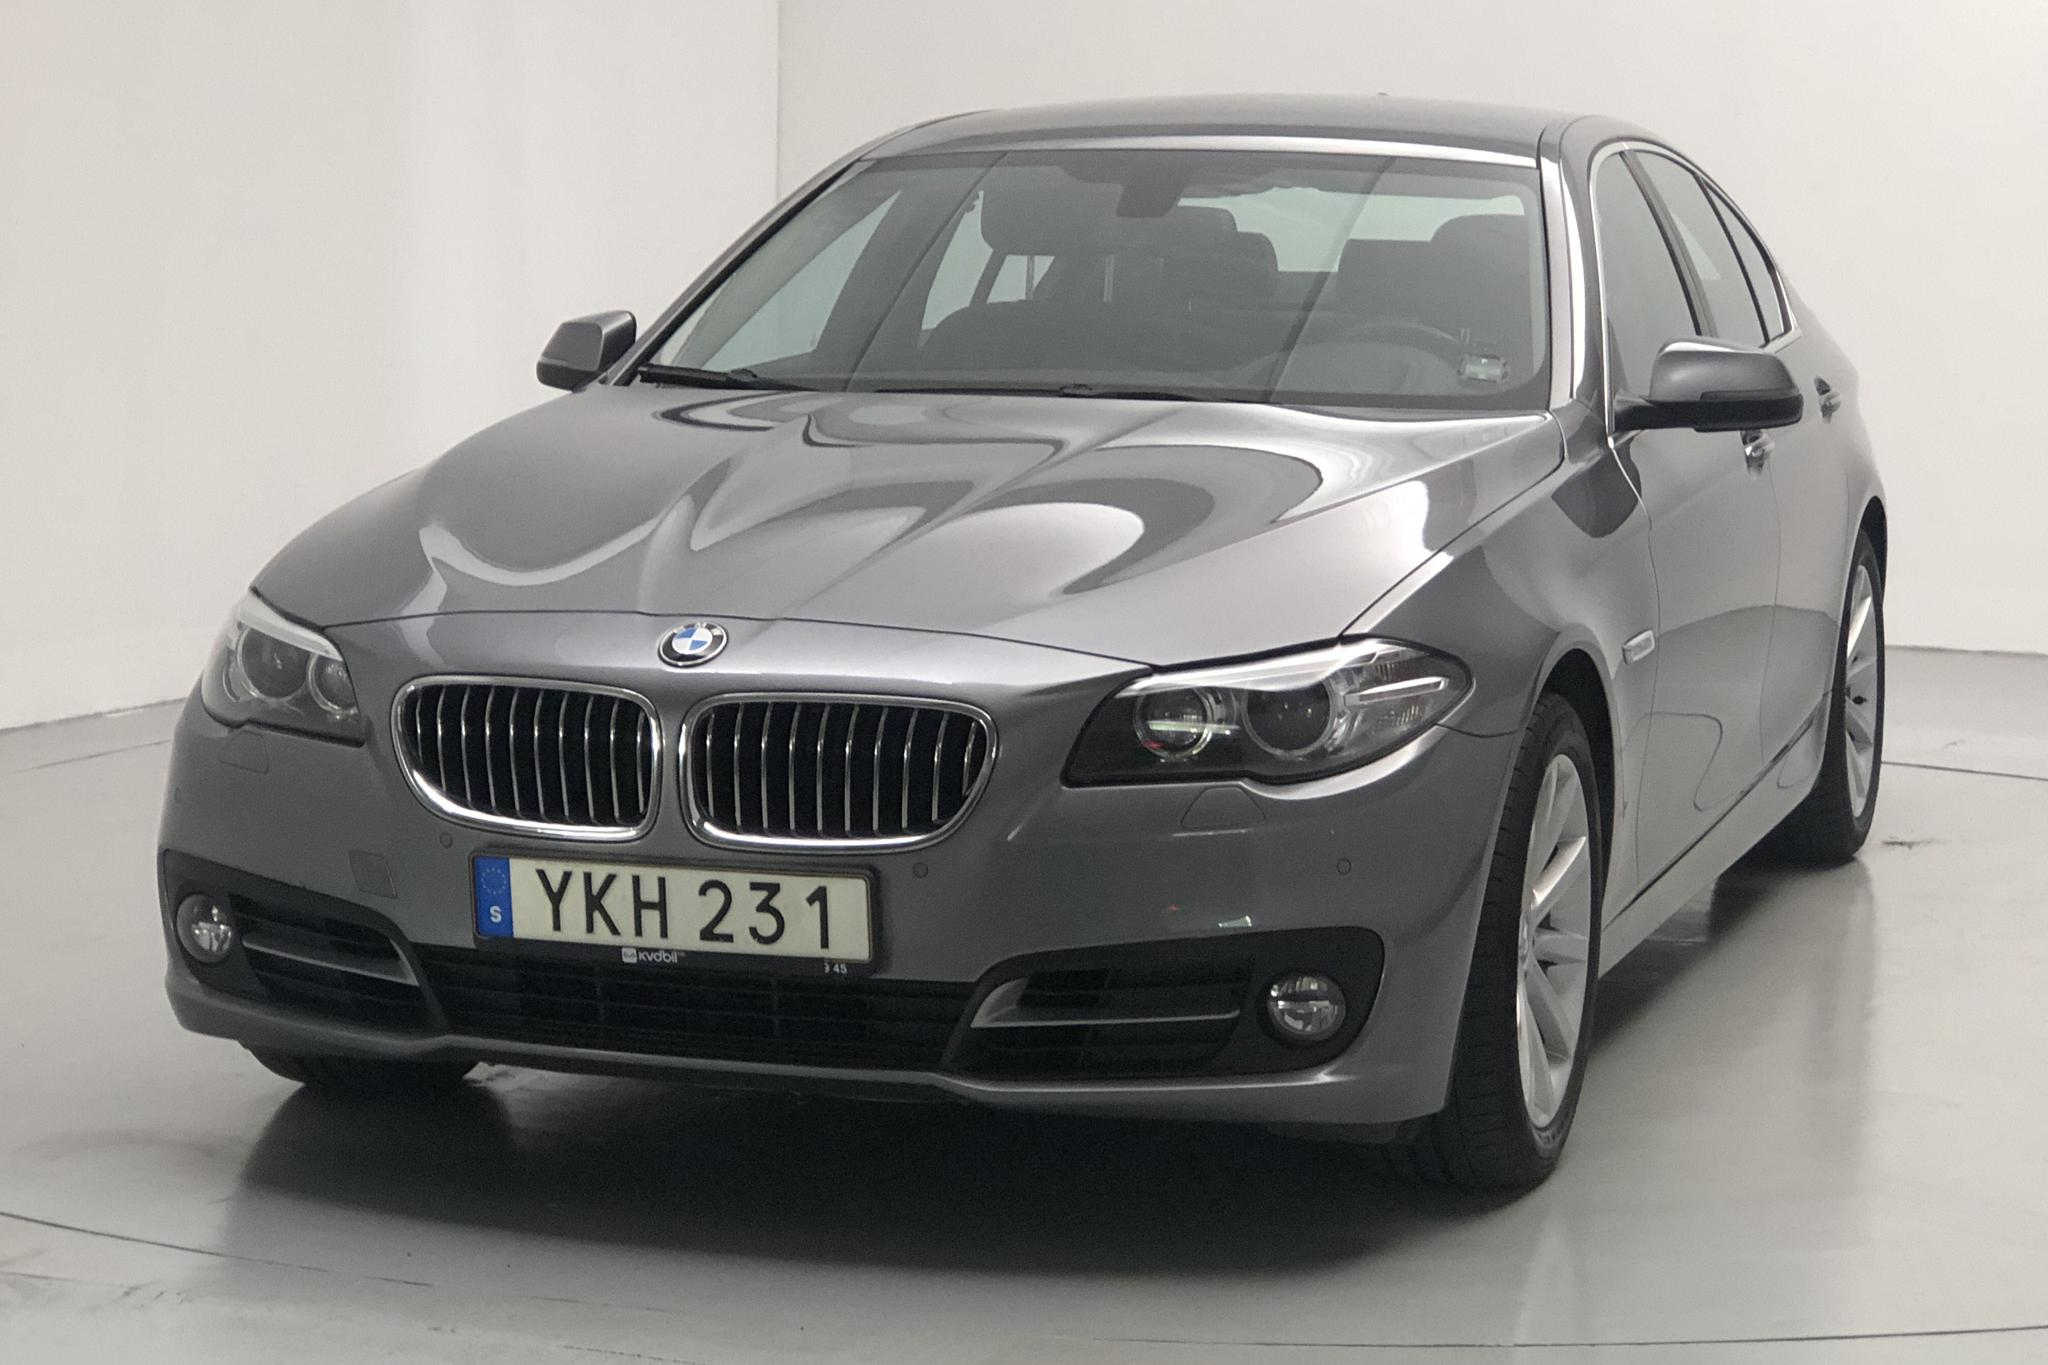 BMW 525d xDrive Sedan, F10 (218hk) - 91 720 km - Automatic - gray - 2014